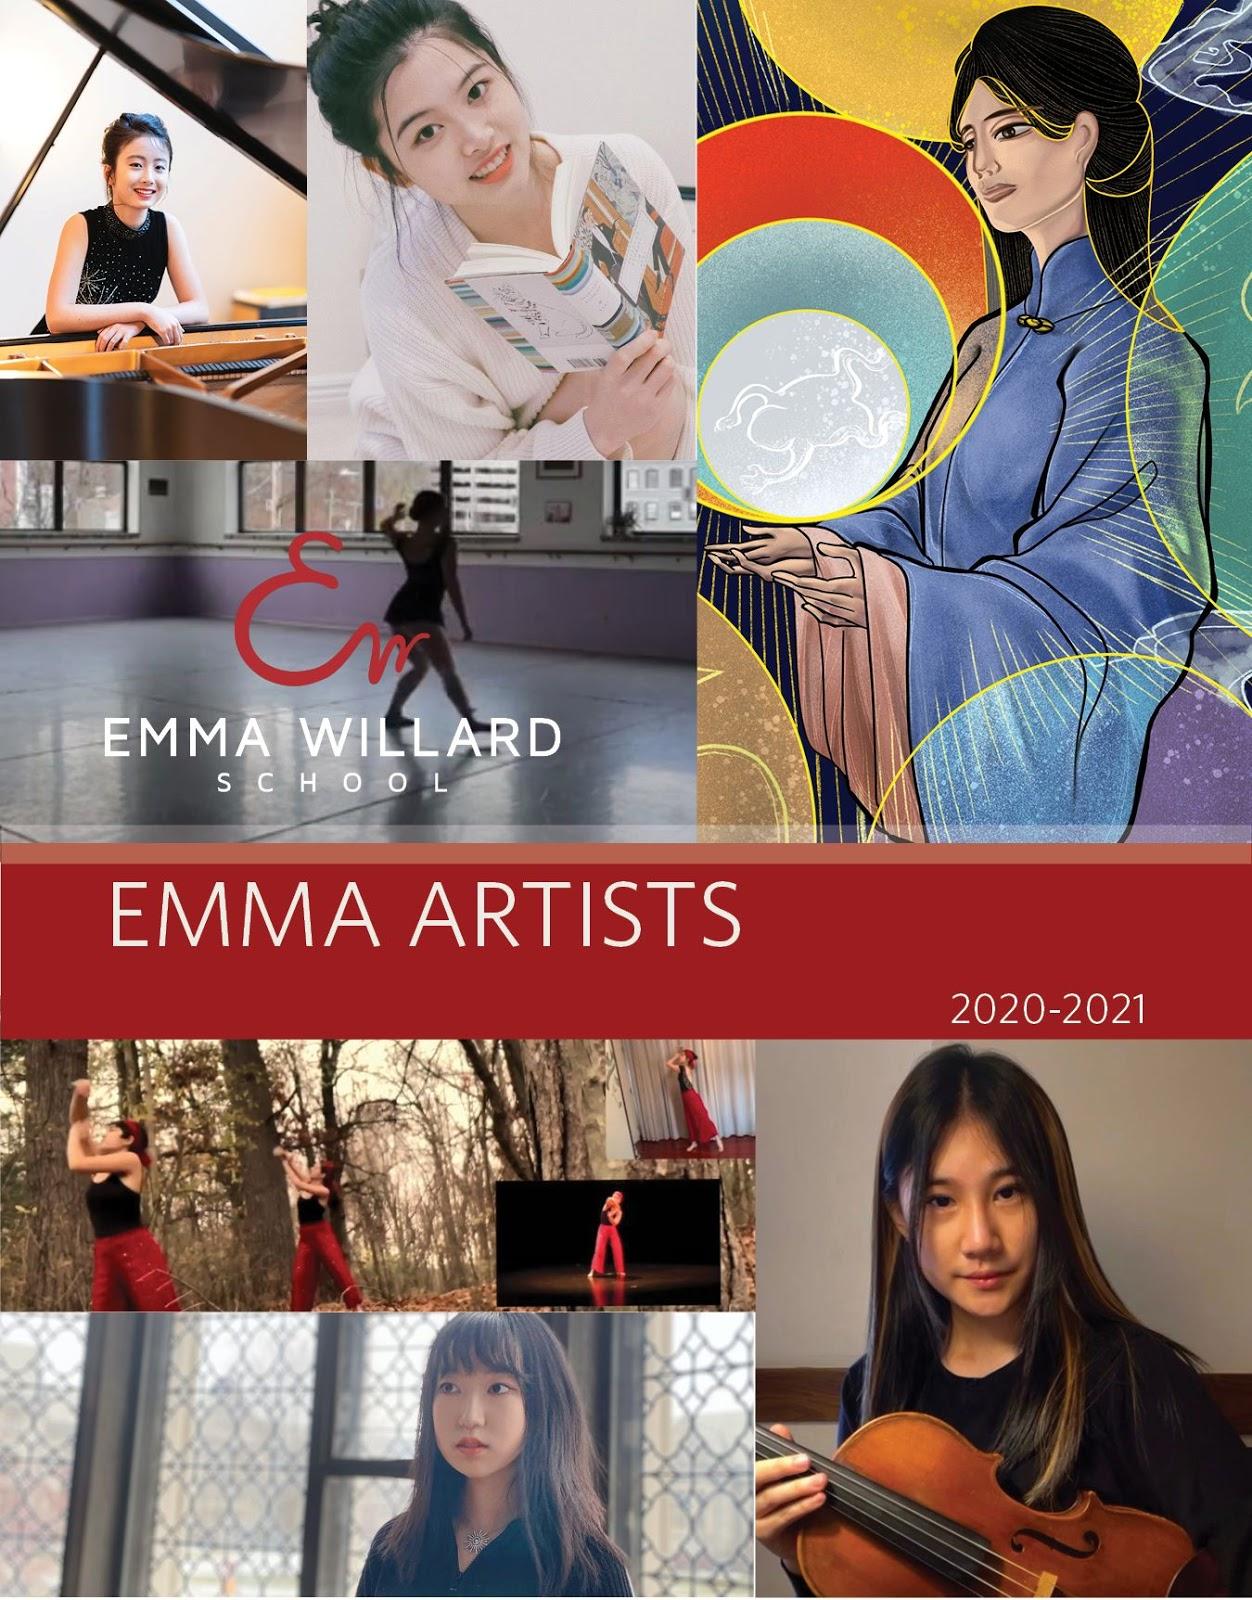 Emma Willard School Emma Artists Showcase